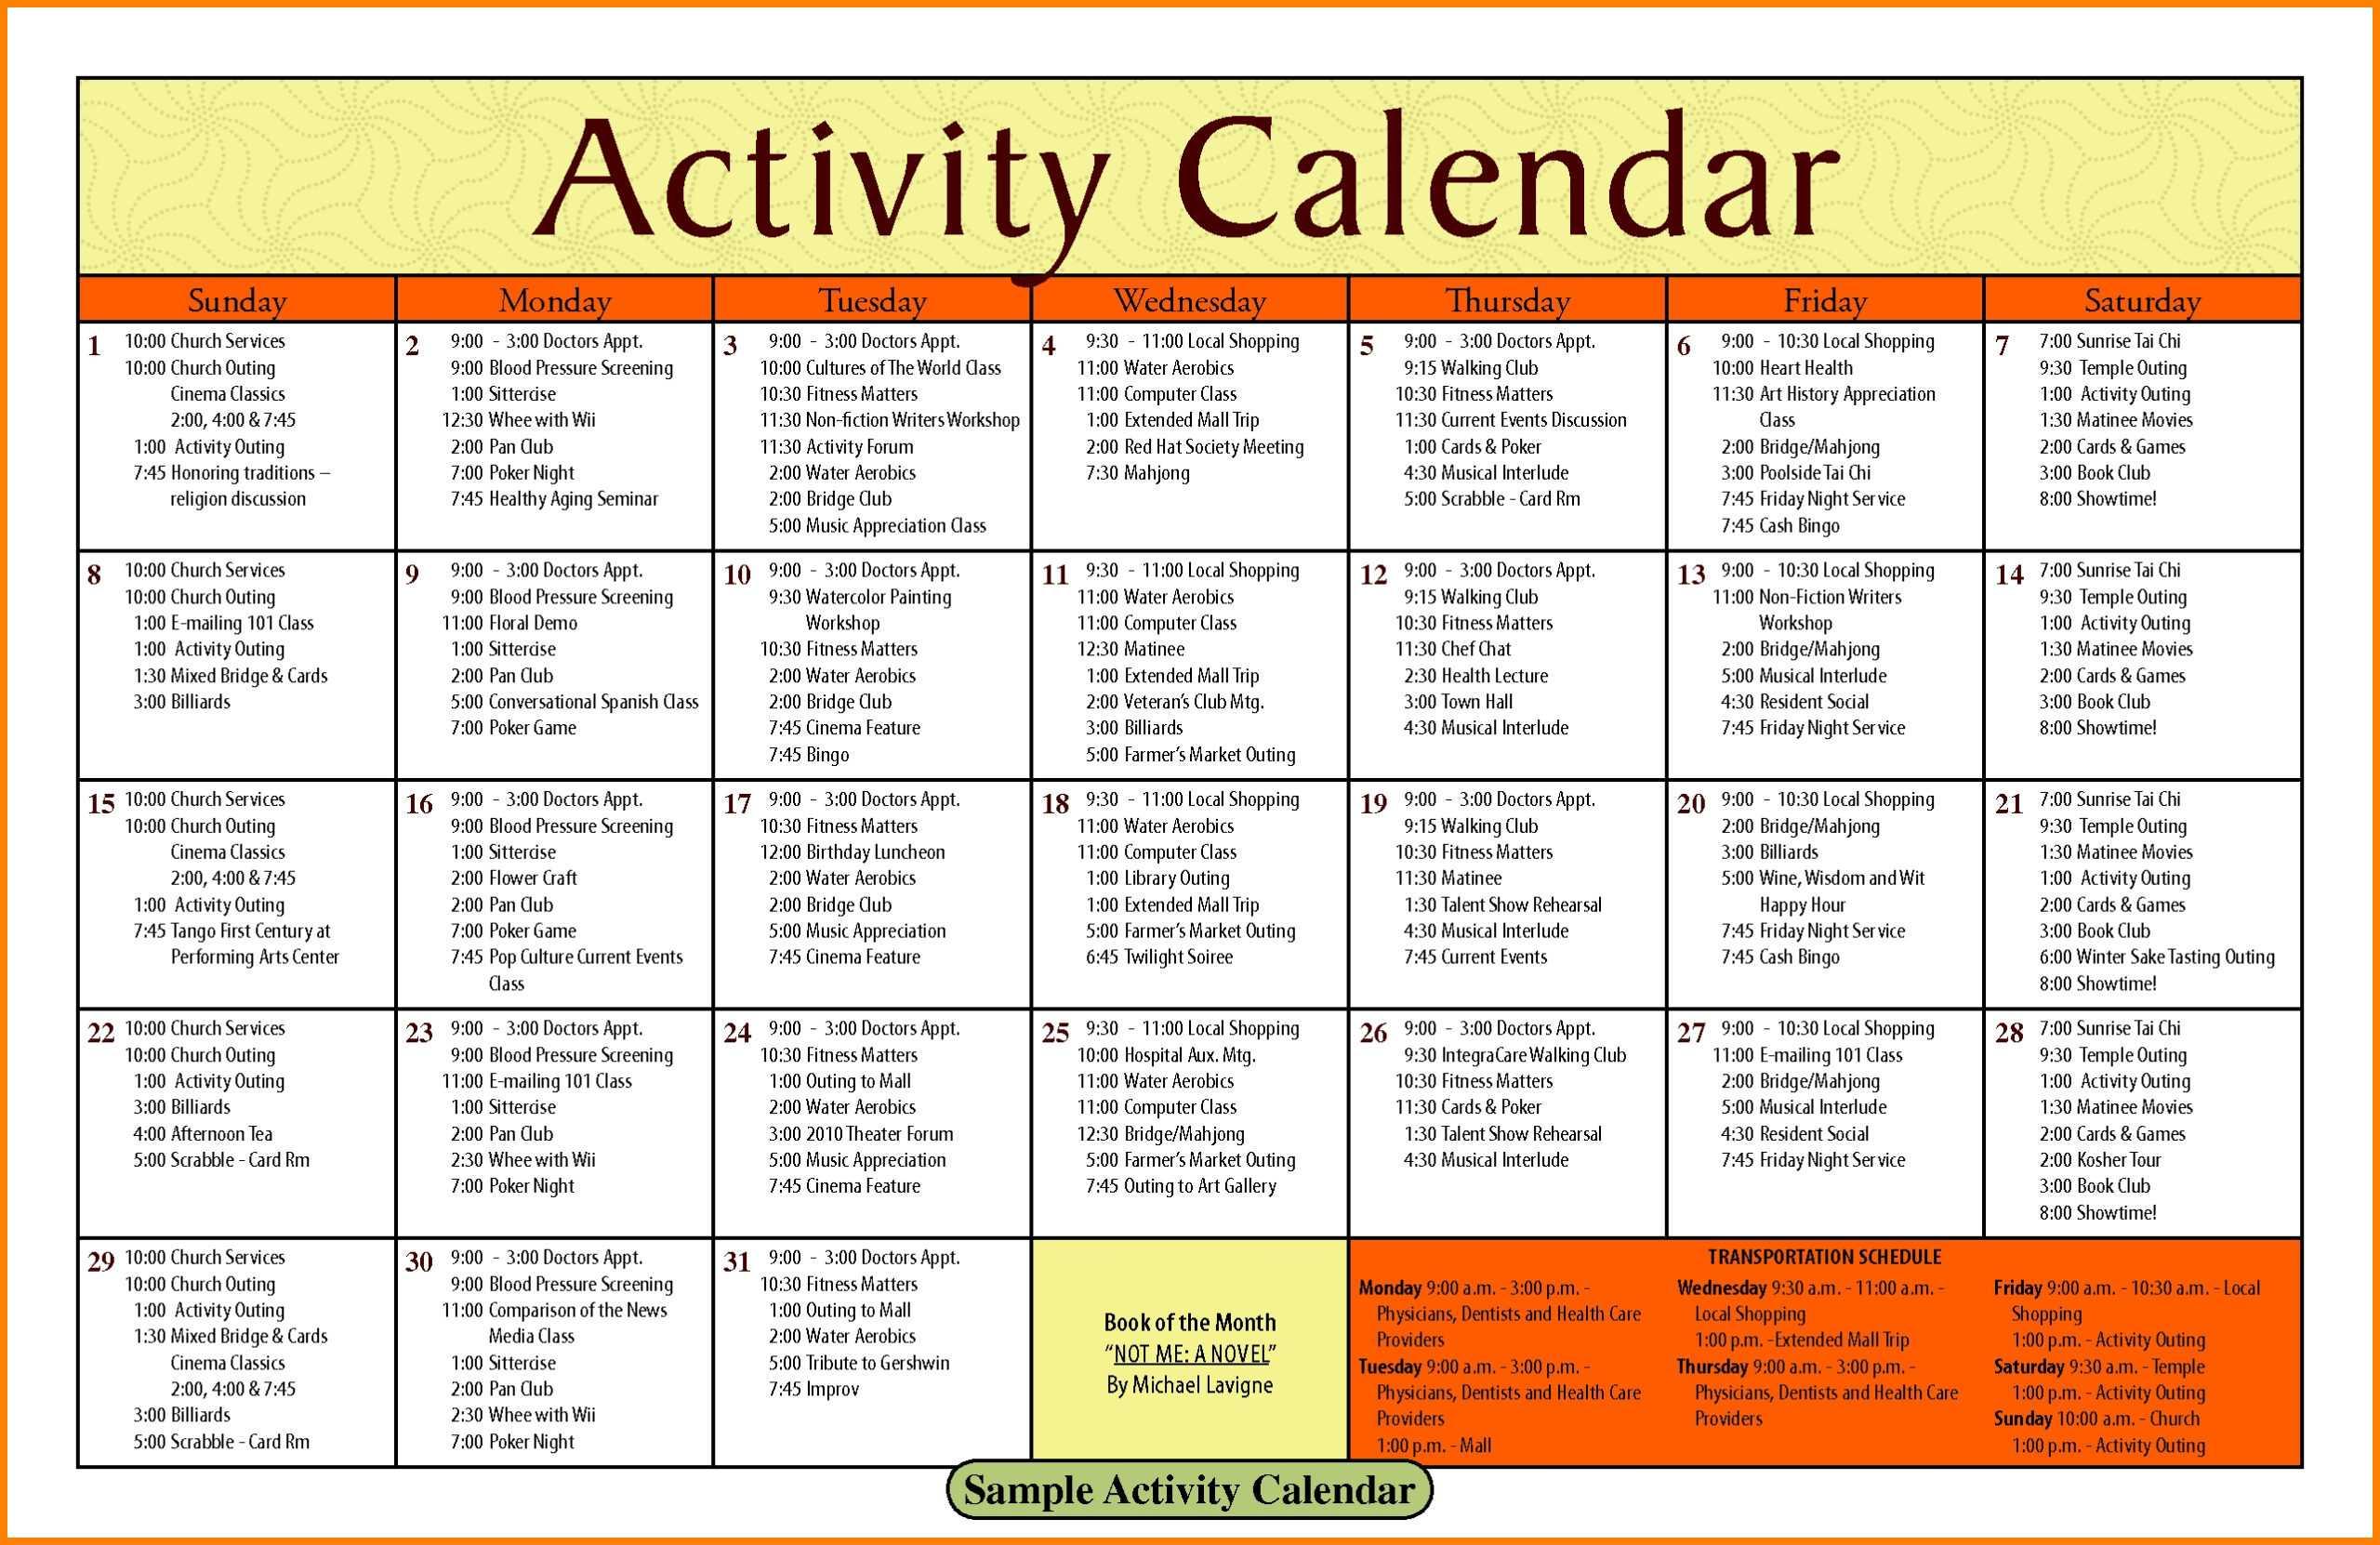 Activity Calendar Template – Printable Week Calendar With Blank Activity Calendar Template